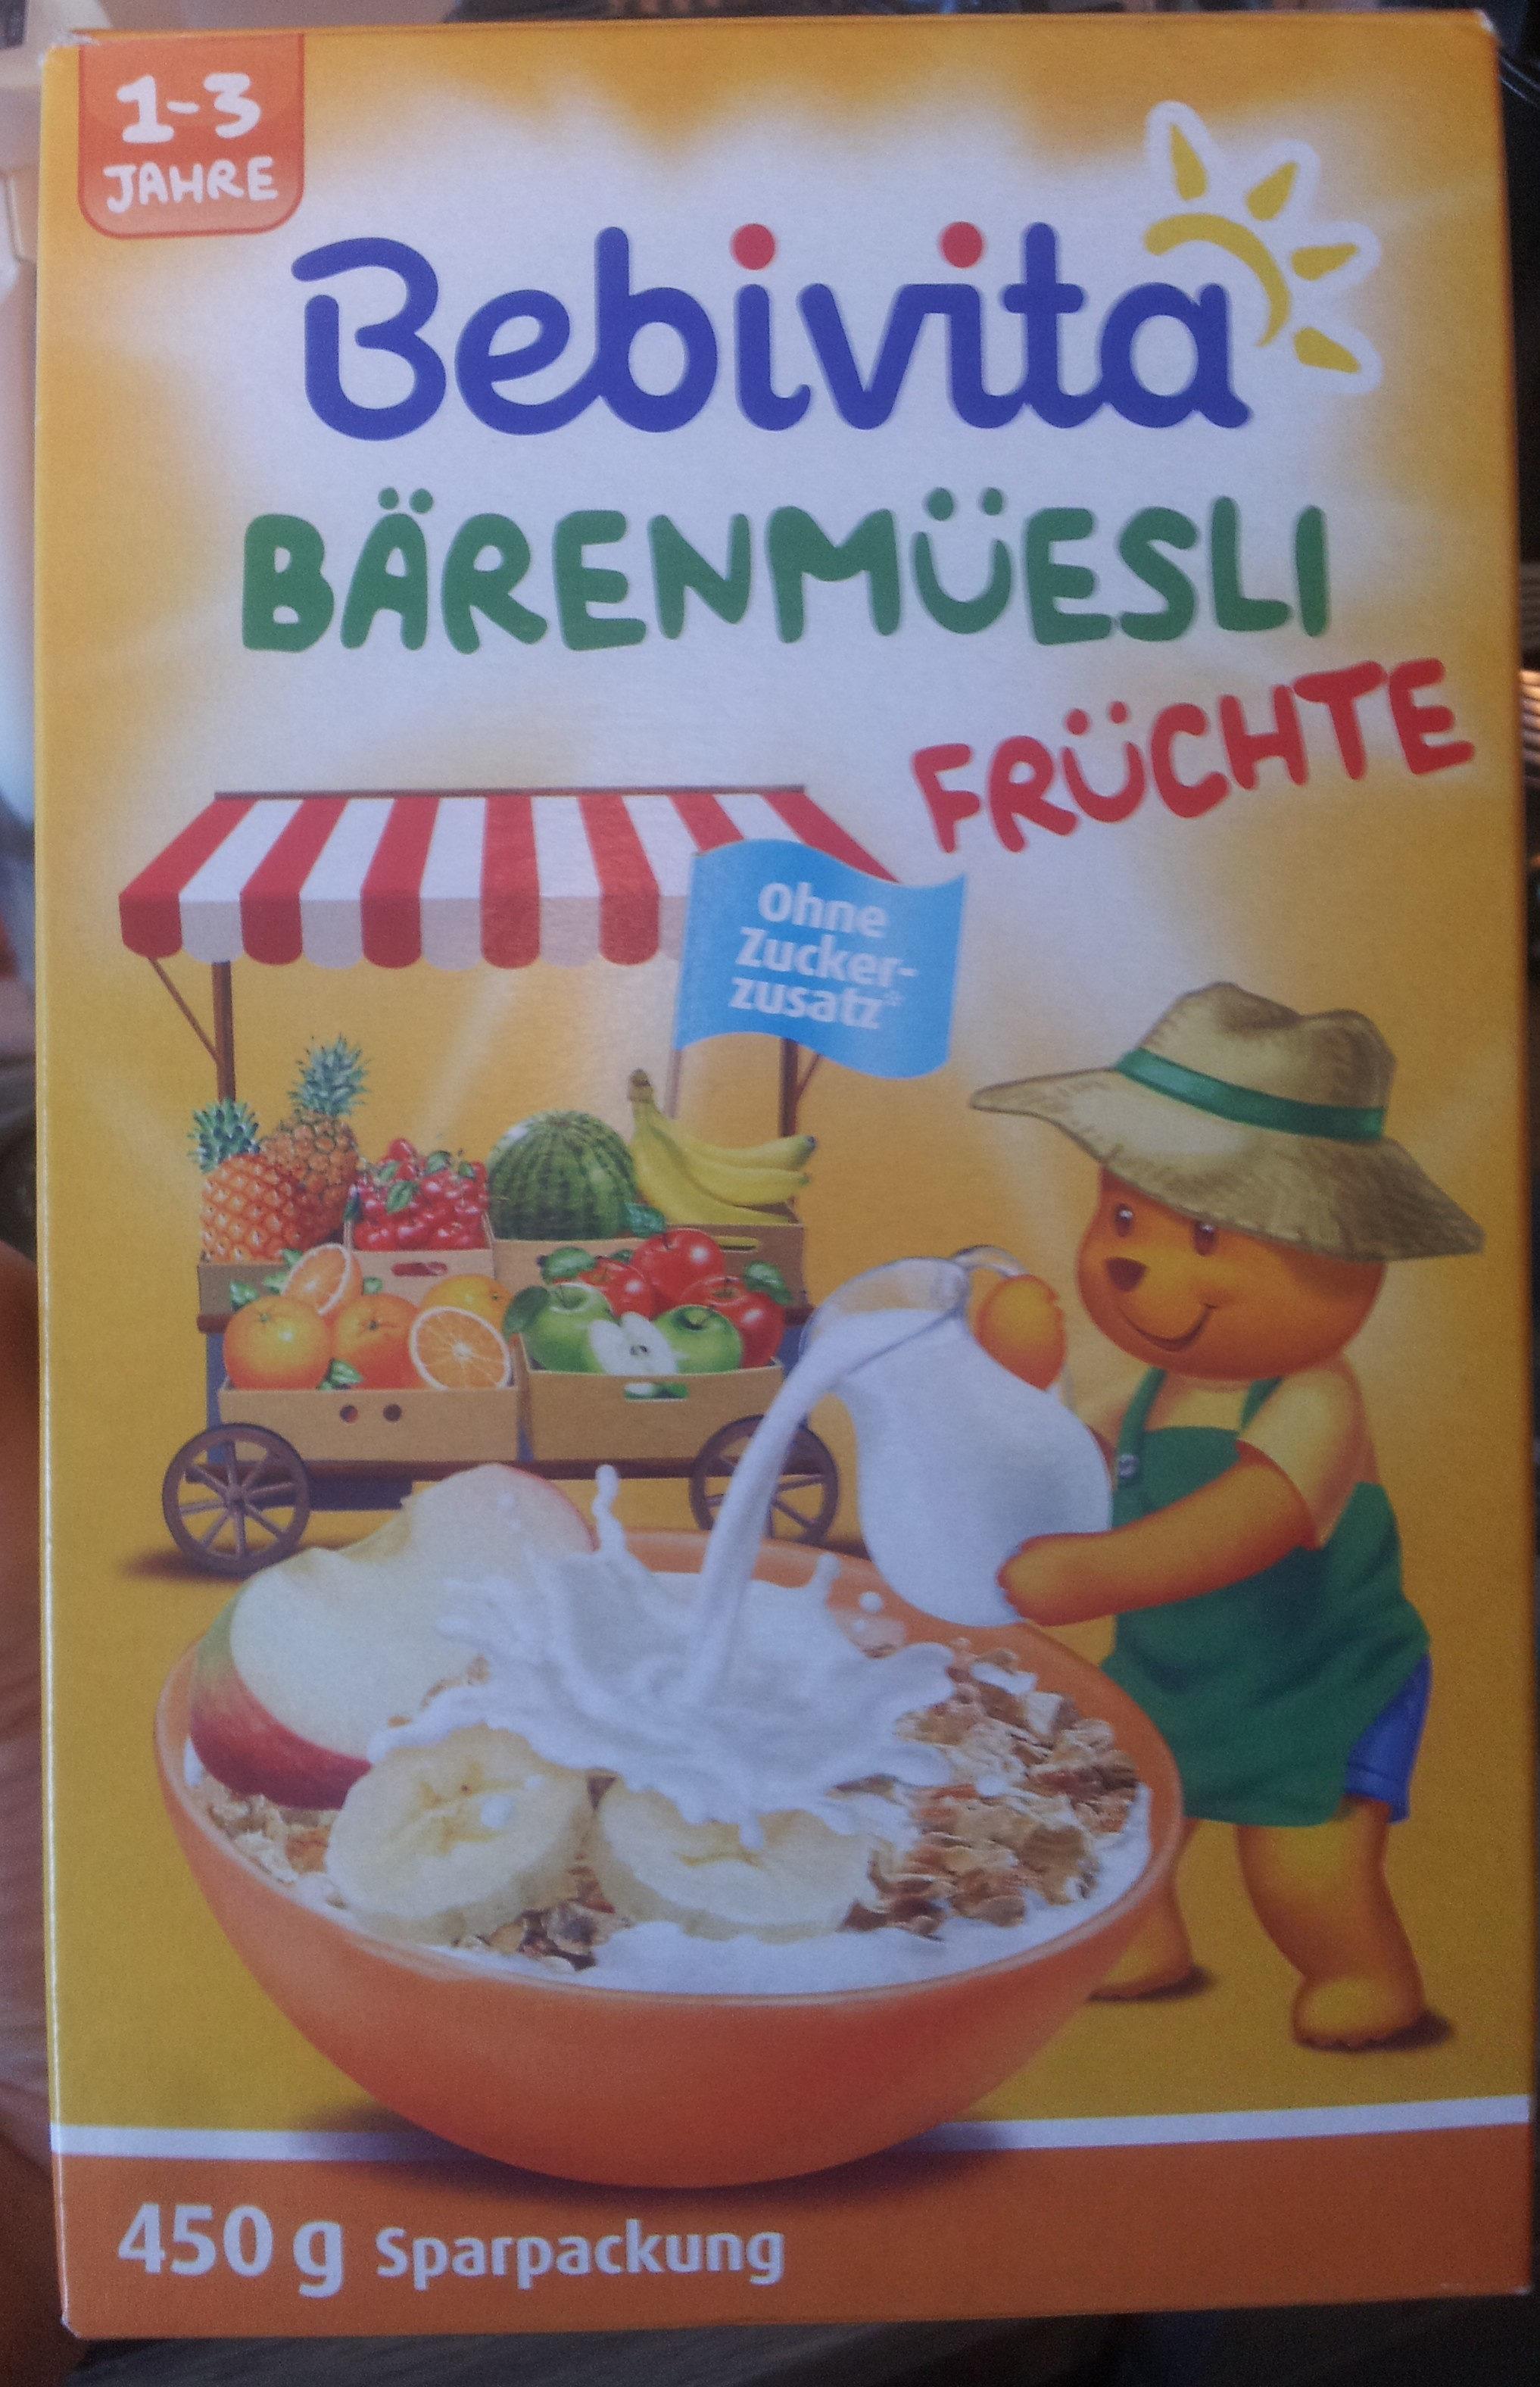 Bärenmüsli Früchte - Product - de